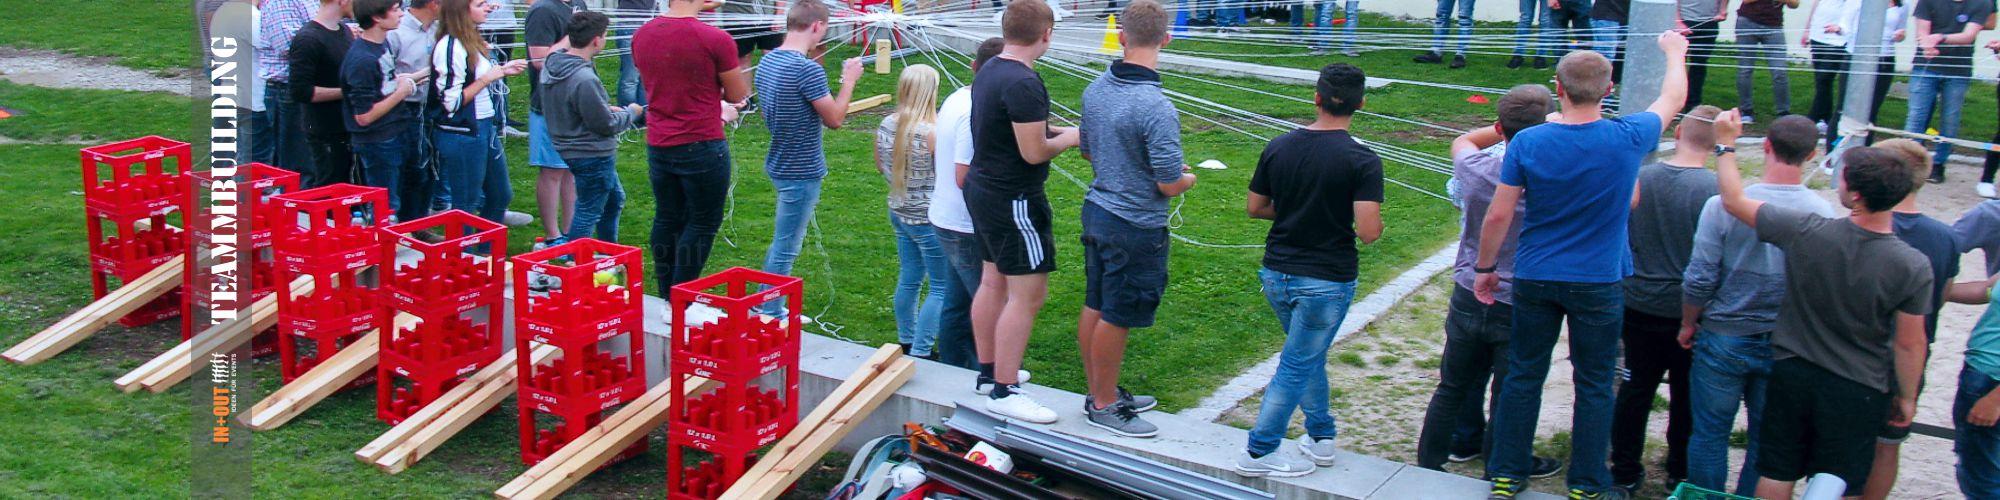 Ideen für Team Events - Azubi Camp - Team Event Nürnberg